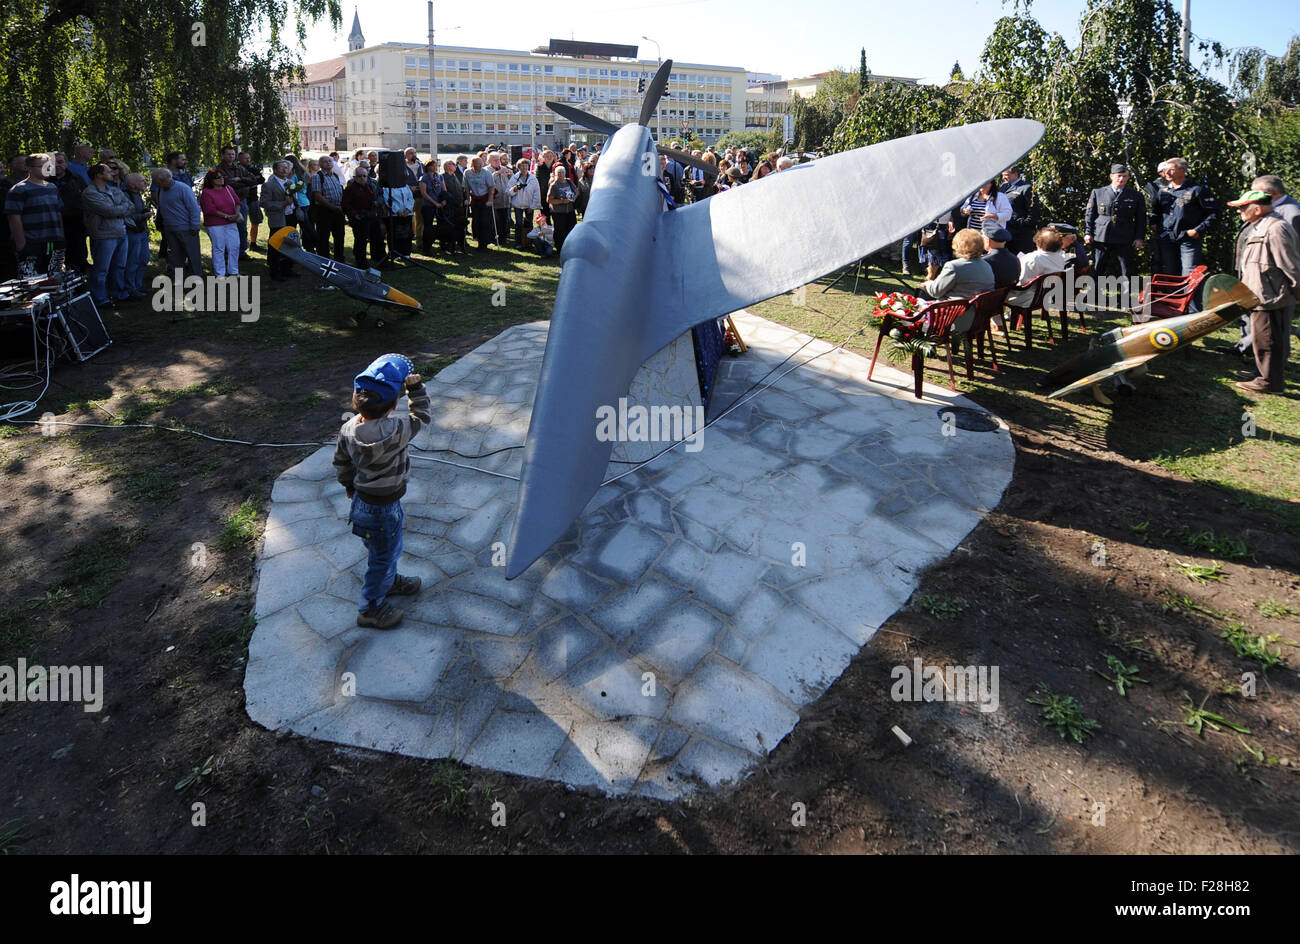 Ceske Budejovice, Czech Republic. 01st Jan, 2007. Ceremonial unveiling of the monument in memory of Czechoslovak - Stock Image